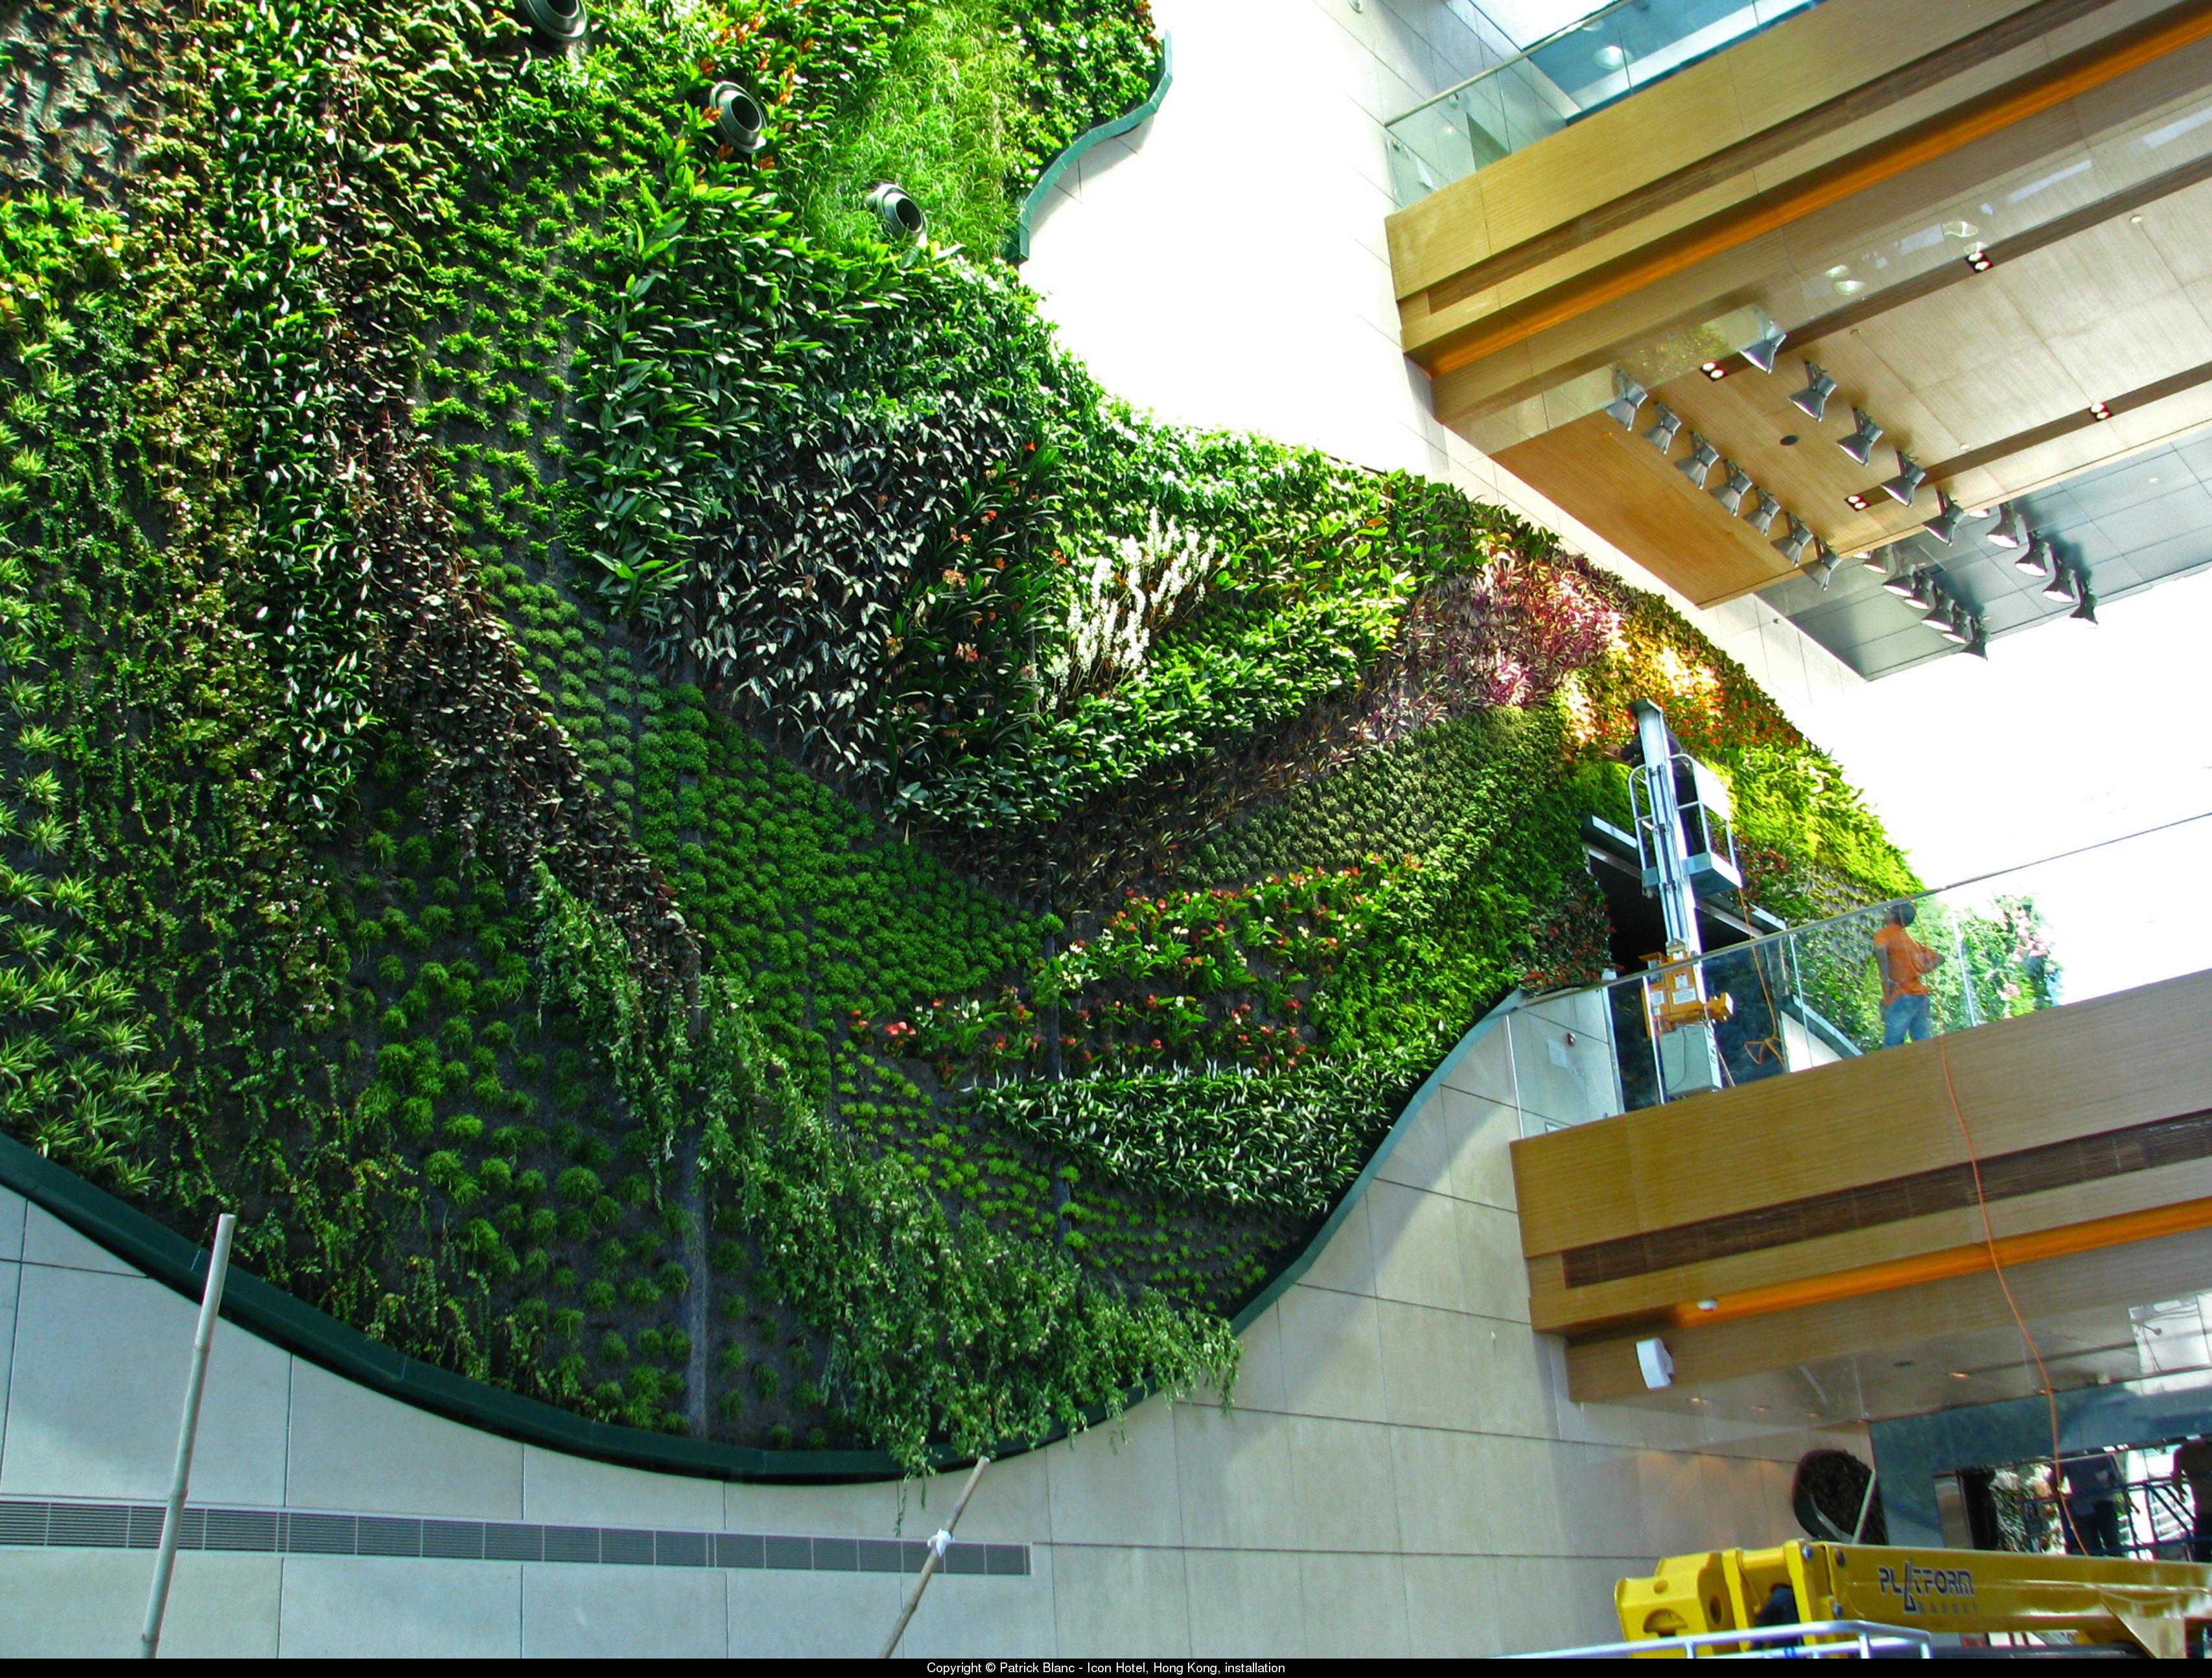 Patrick blanc jardines verticales aryse for Muros y fachadas verdes jardines verticales